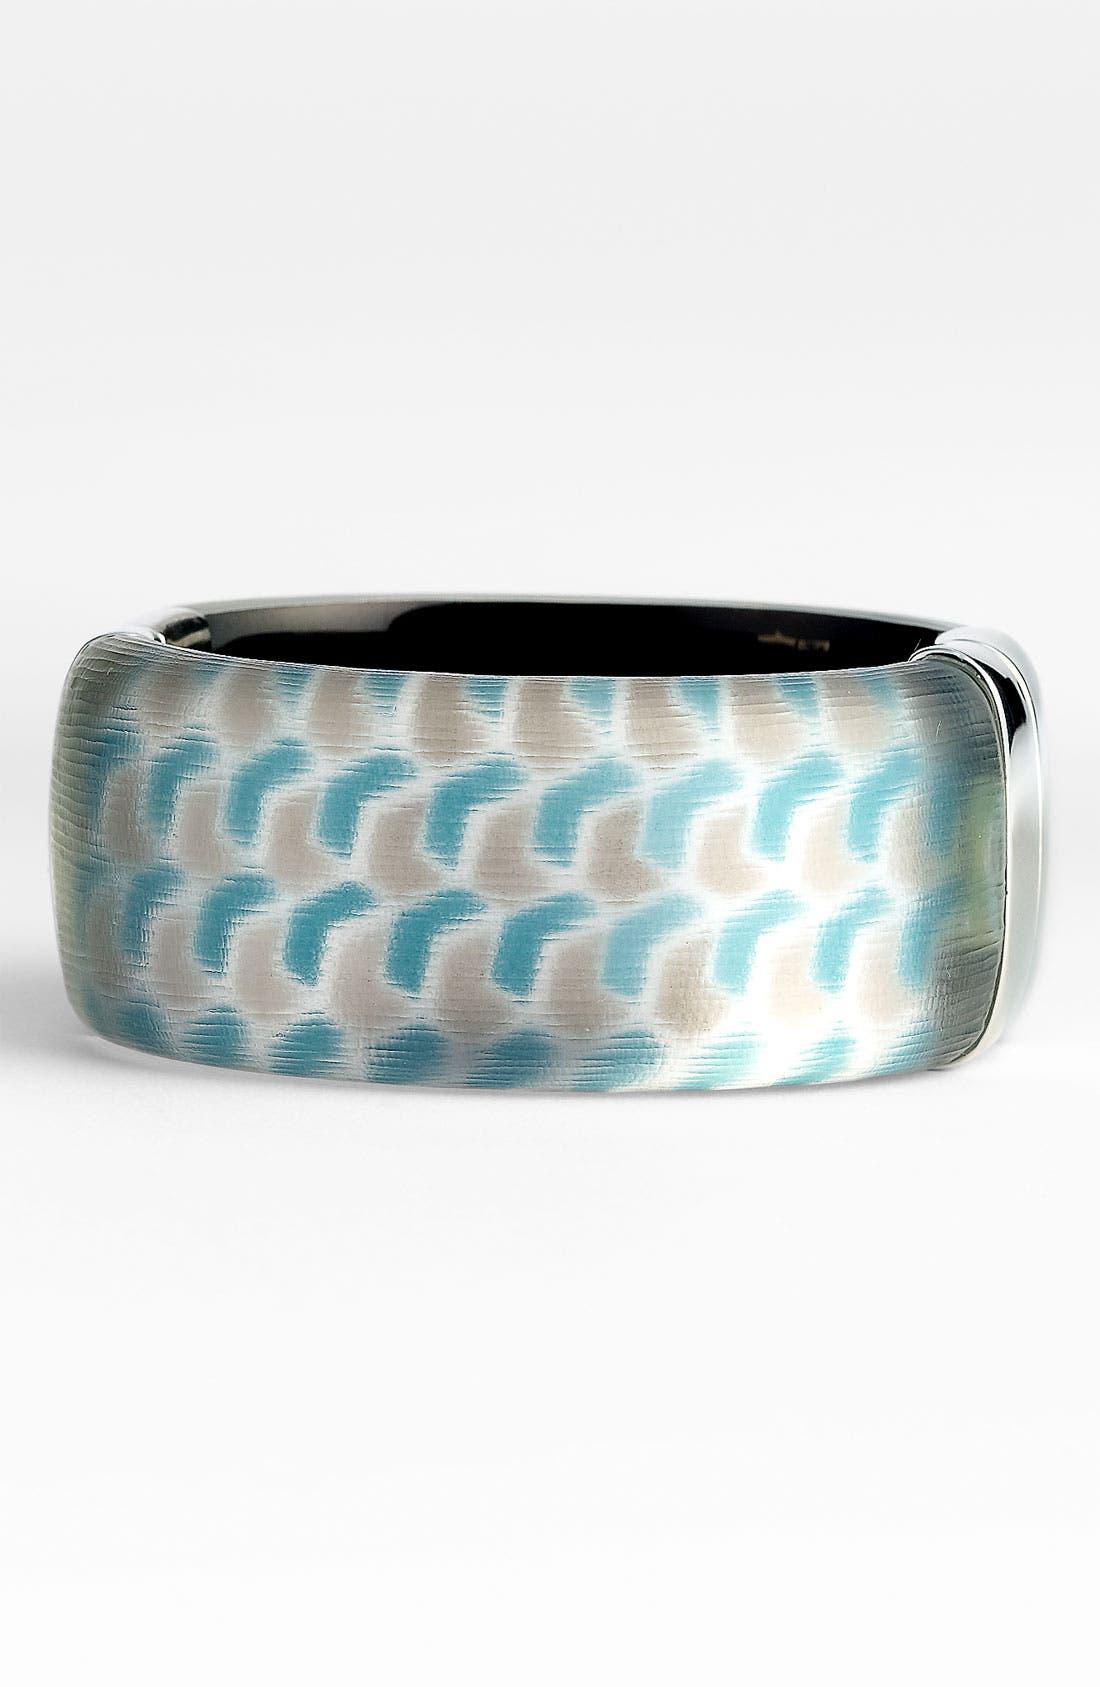 Alternate Image 1 Selected - Alexis Bittar 'Deco' Hinged Bracelet (Nordstrom Exclusive)